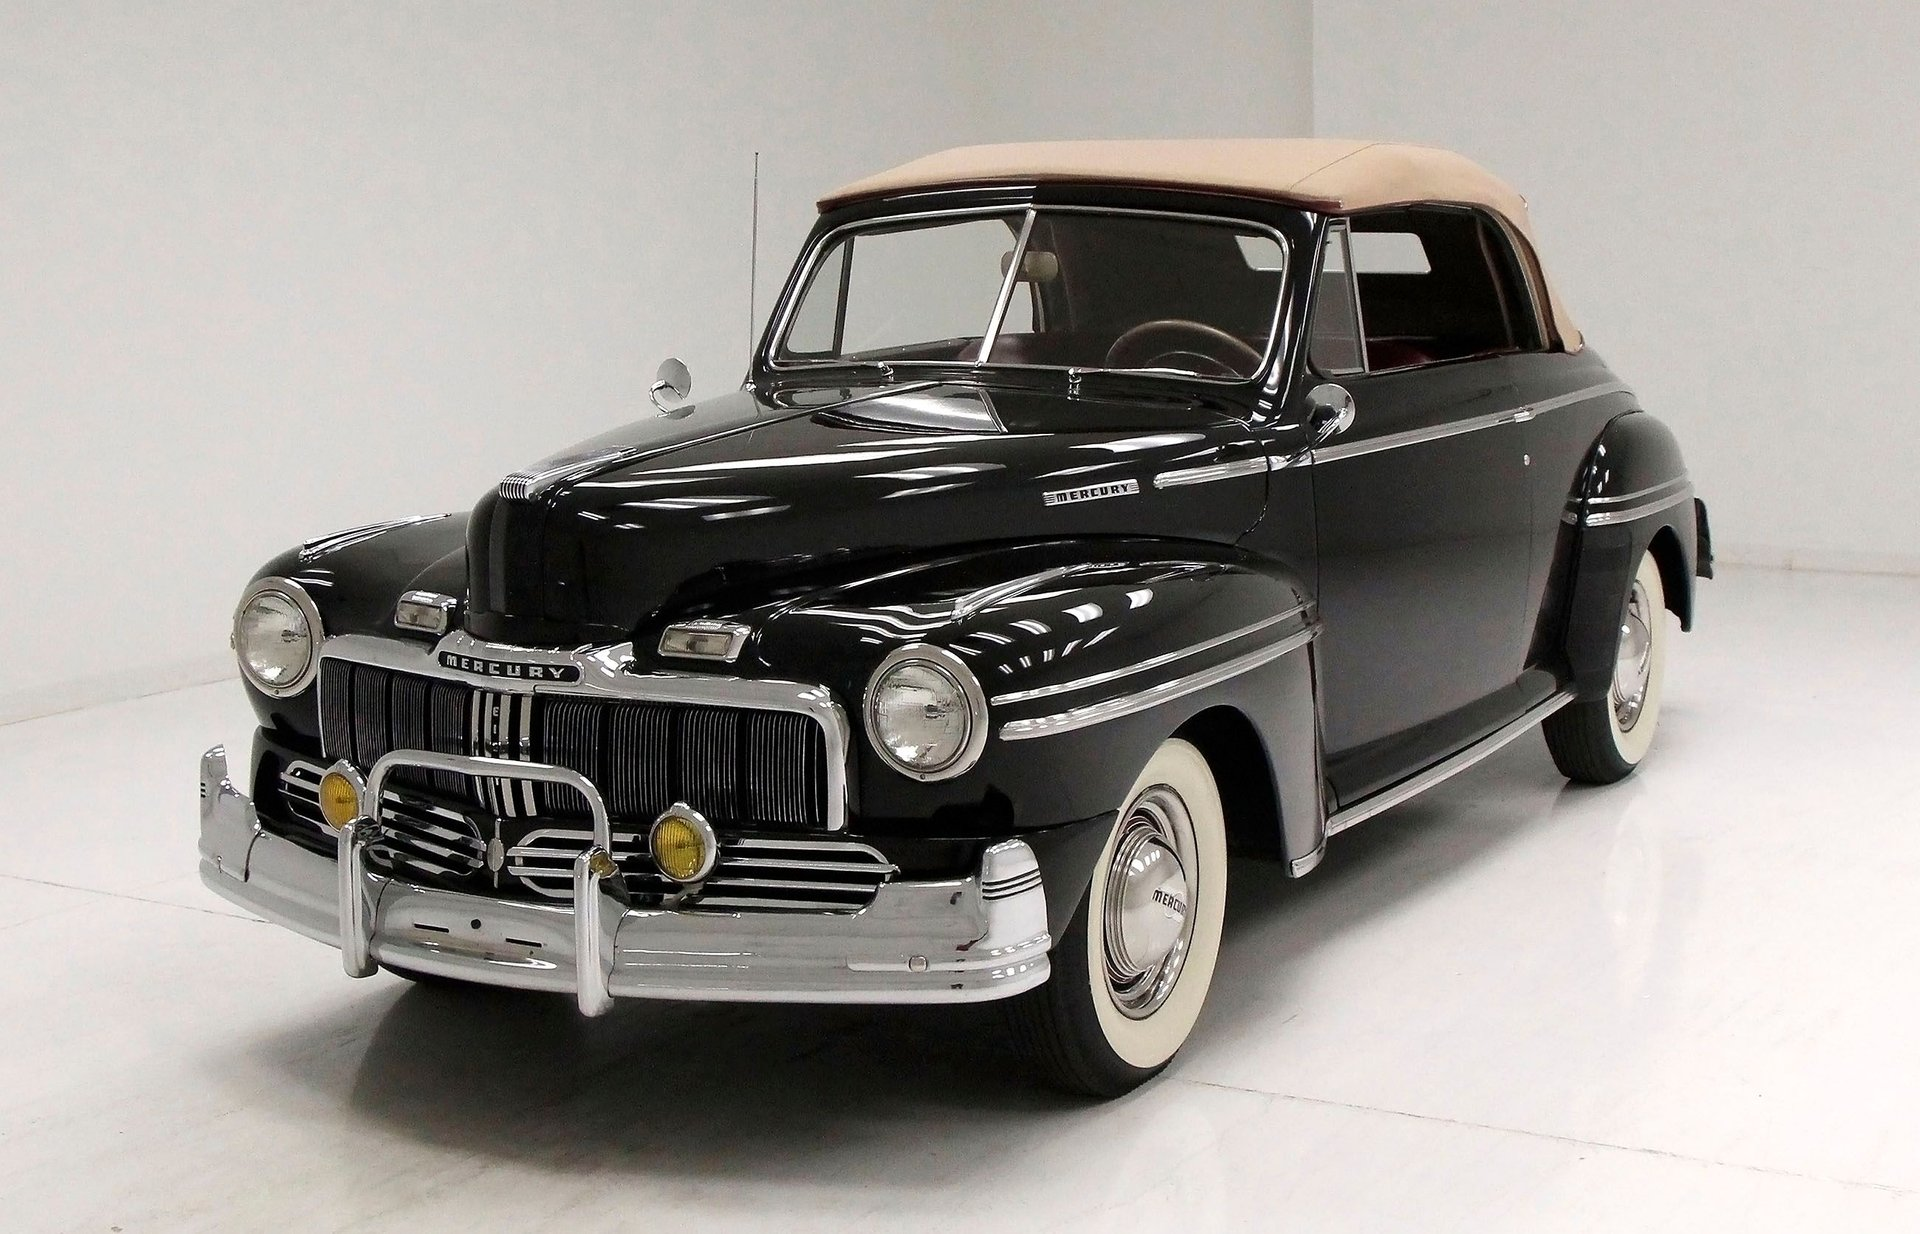 1948 Mercury Deluxe 8